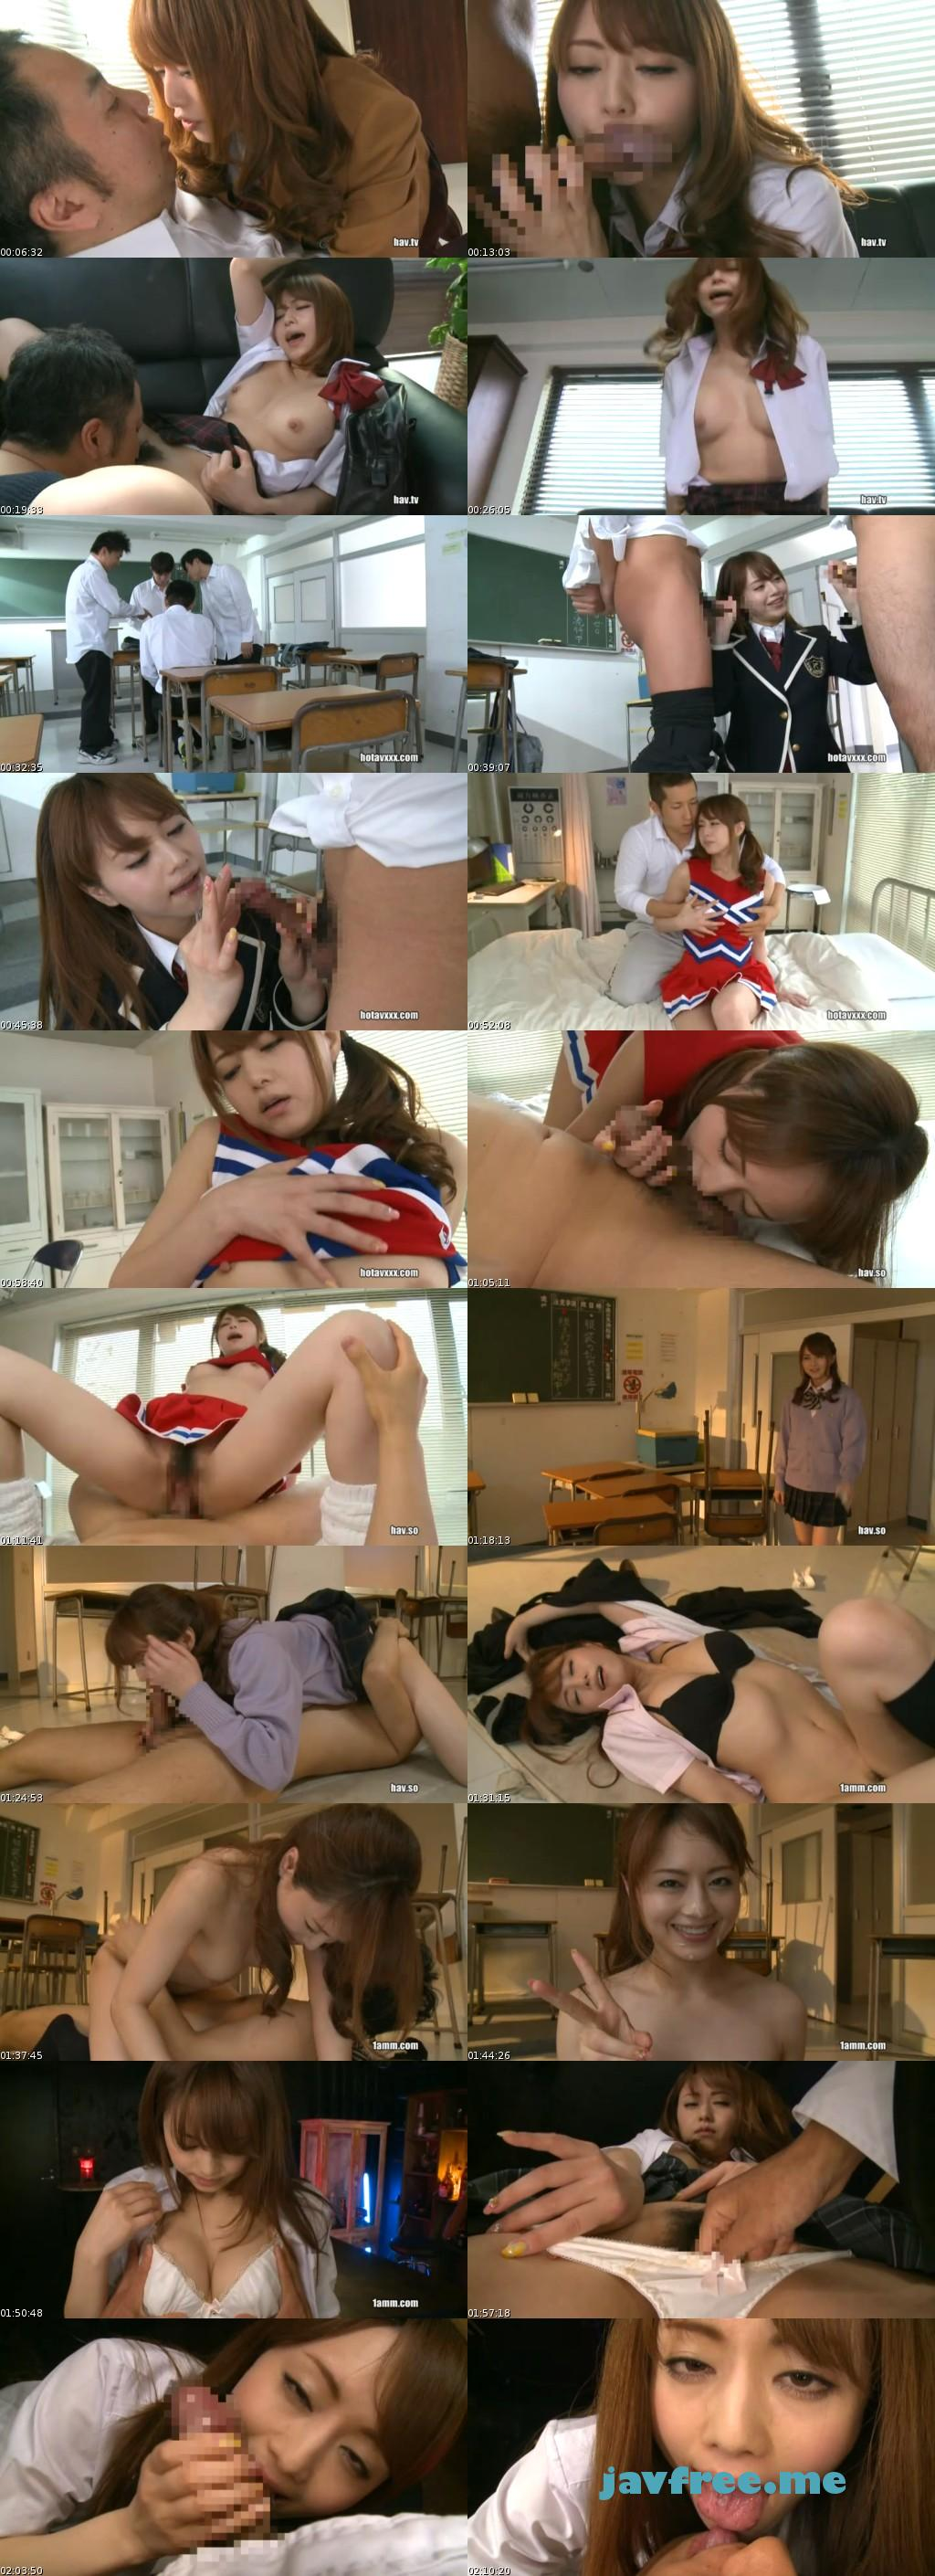 [MXGS 537] 吉沢明歩は20代後半のハンパないほど経験豊富な女子校生。 吉沢明歩 MXGS